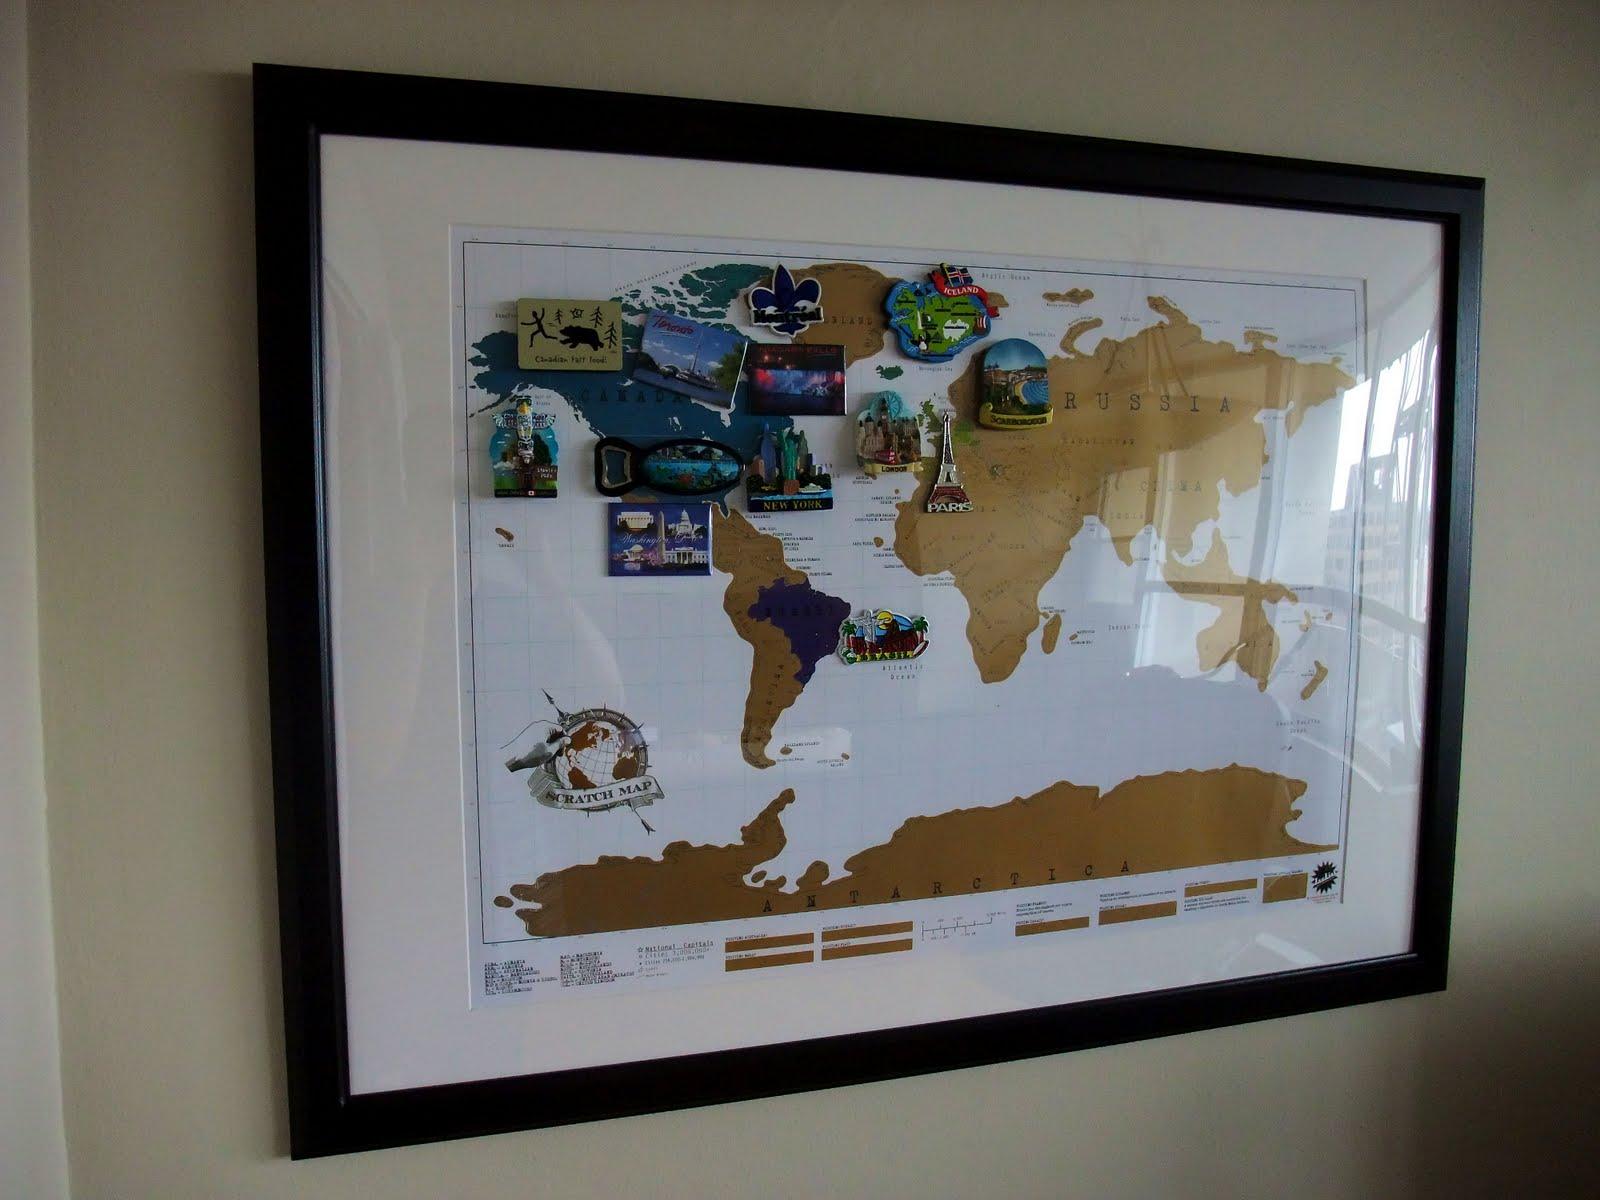 scratch-map-framed